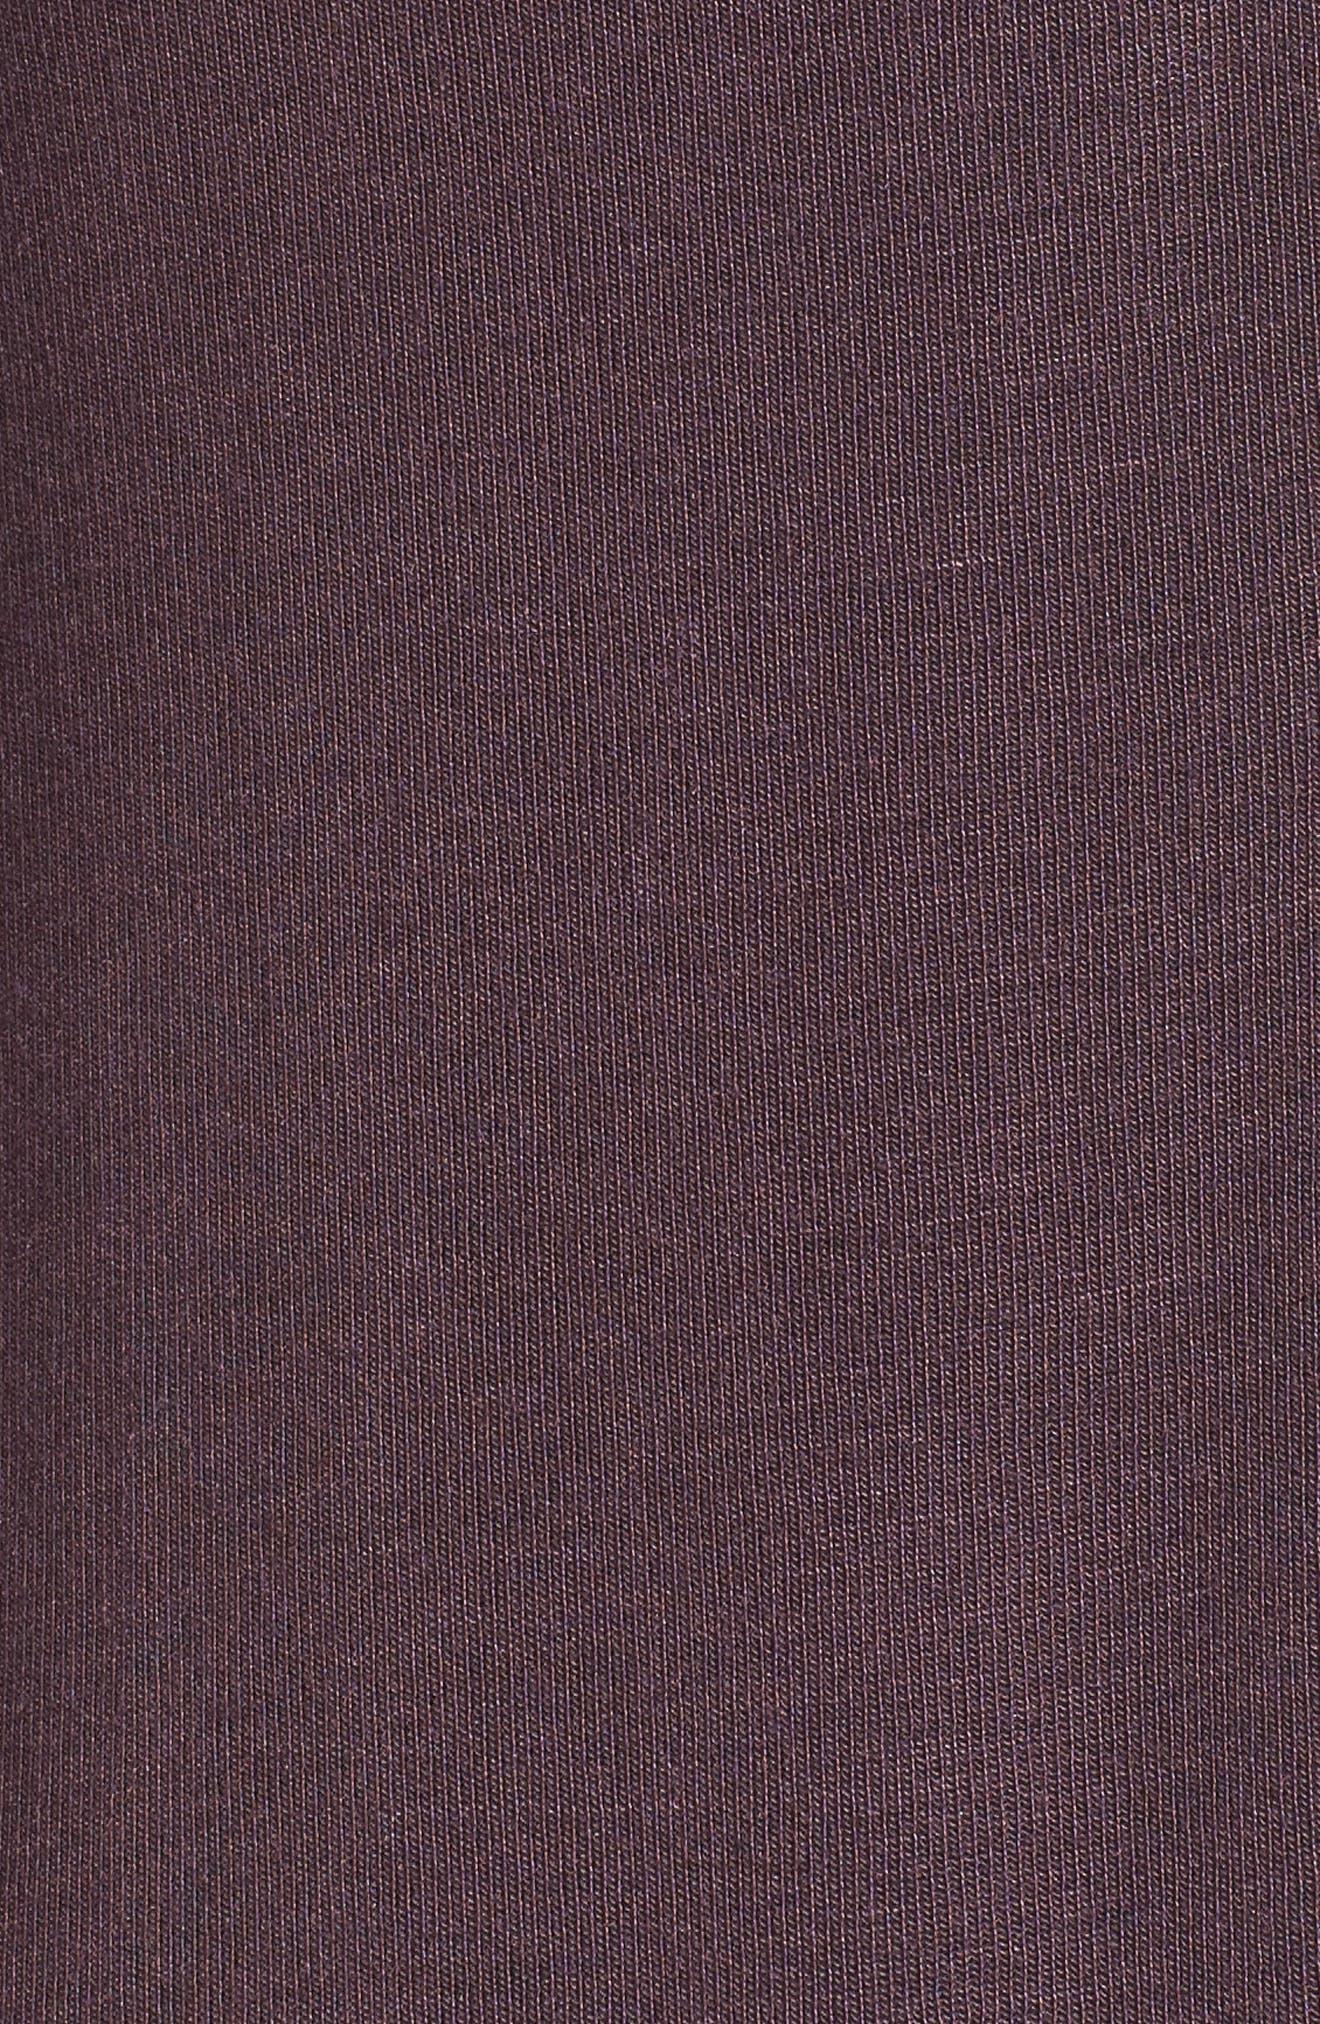 Ruched Sleeve Cardigan,                             Alternate thumbnail 6, color,                             Burgundy Stem